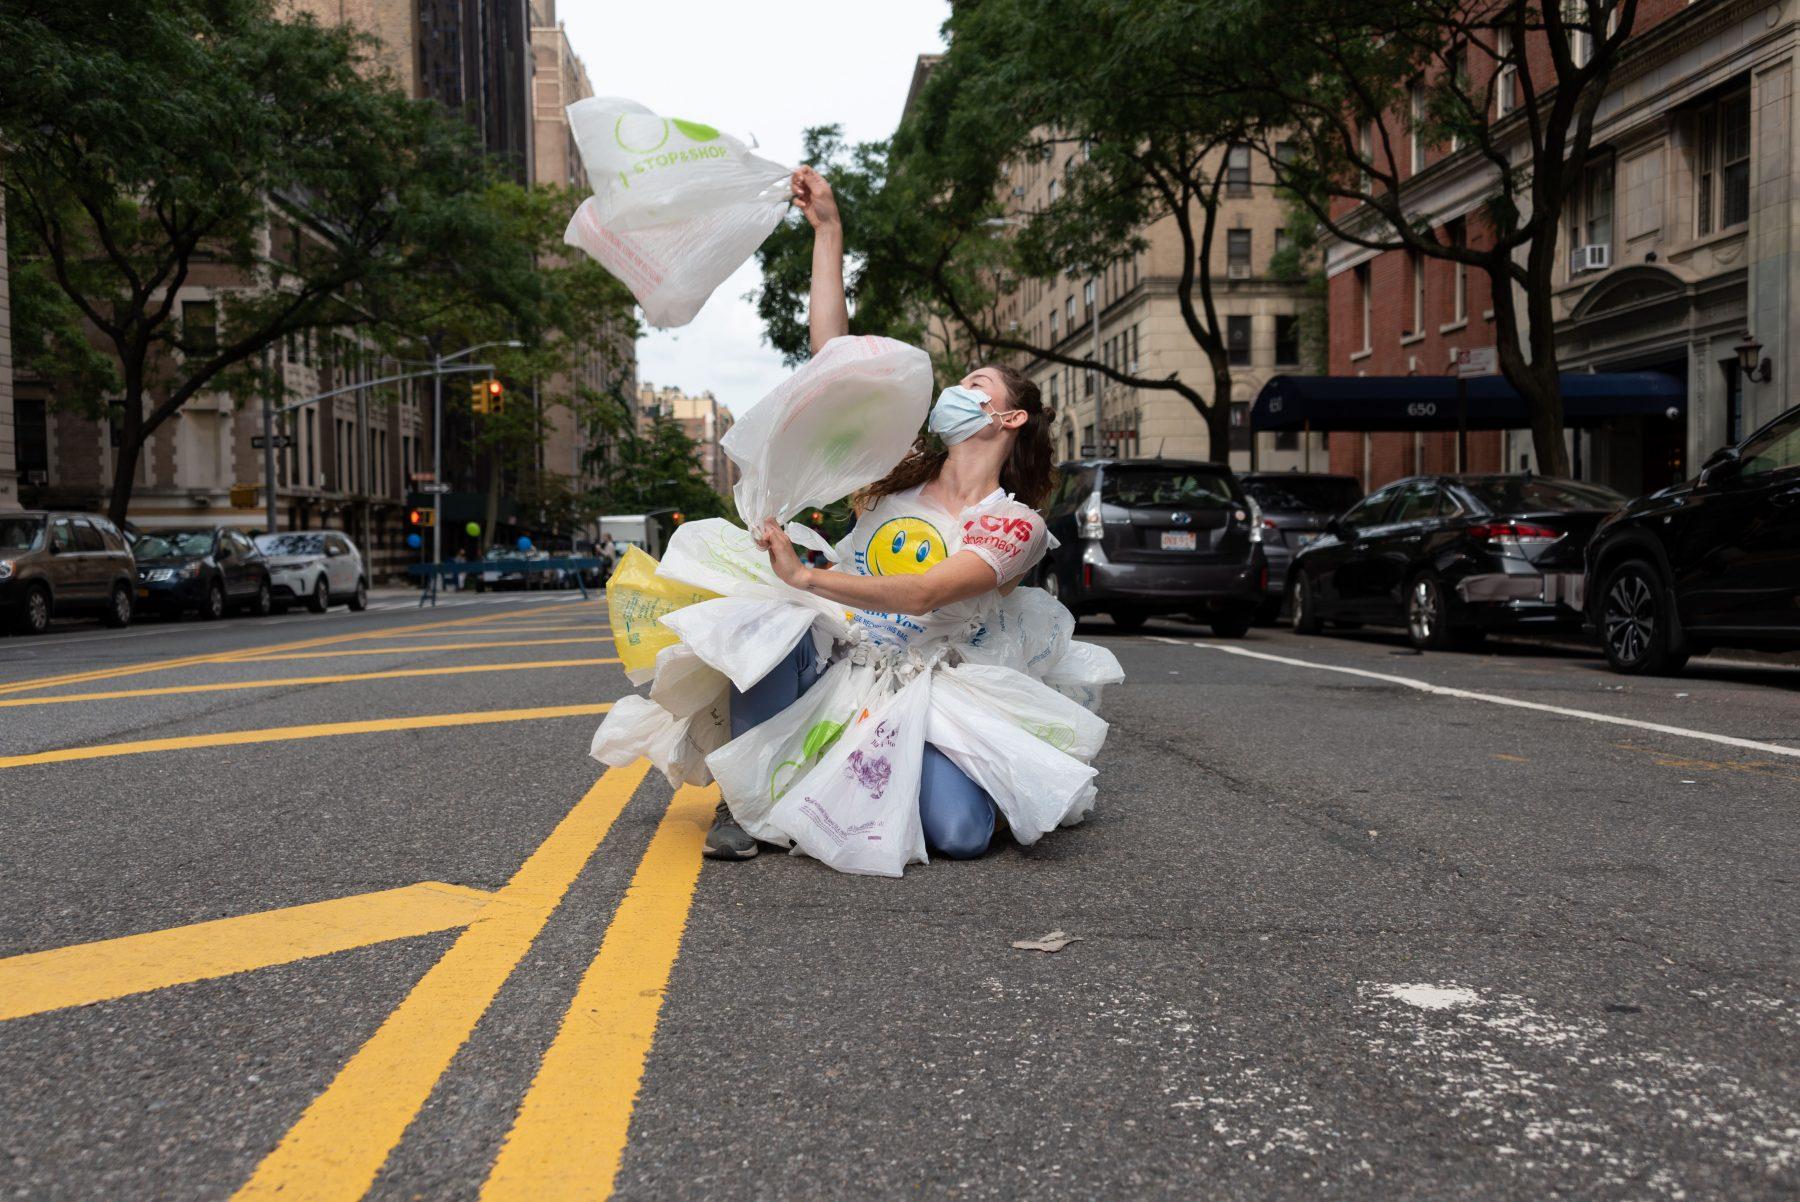 Street Arts: An Earth Day Celebration